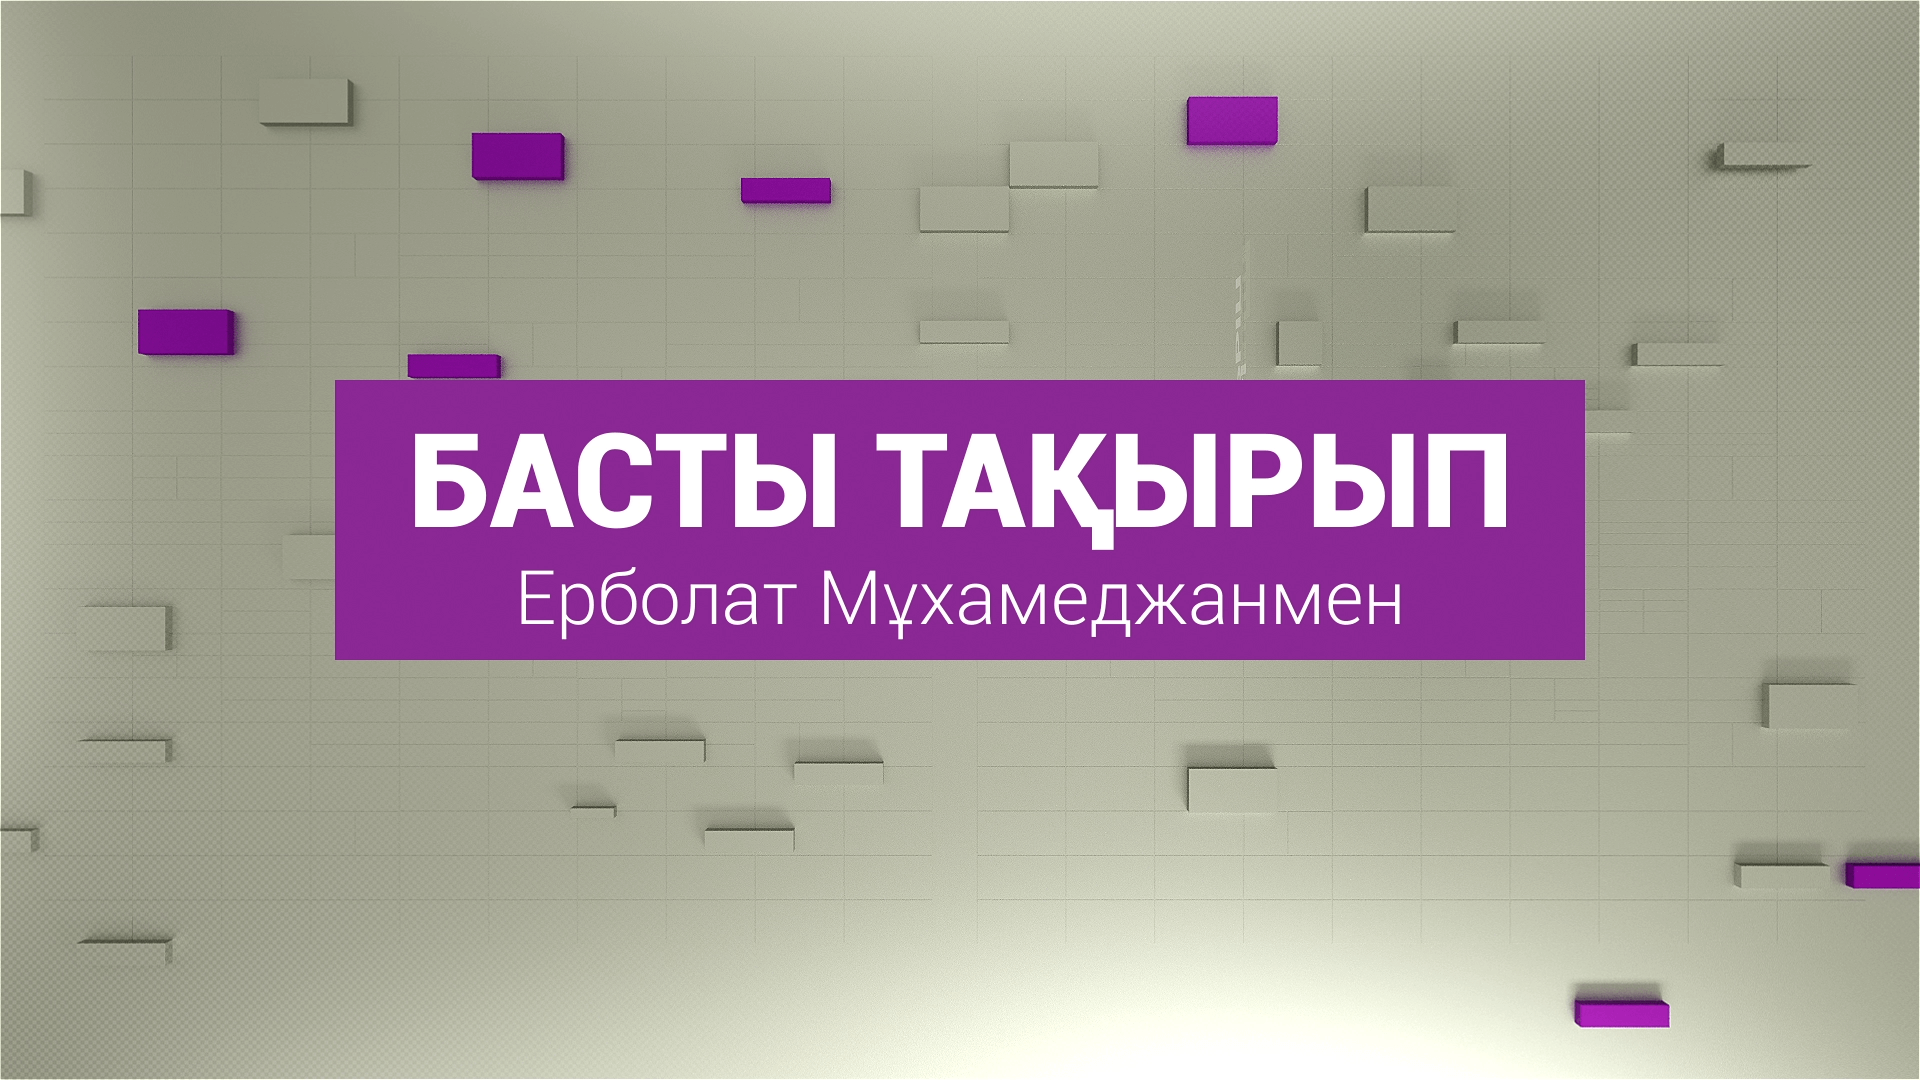 https://inbusiness.kz/ru/images/programbig/9/images/pj4gq9cF.png